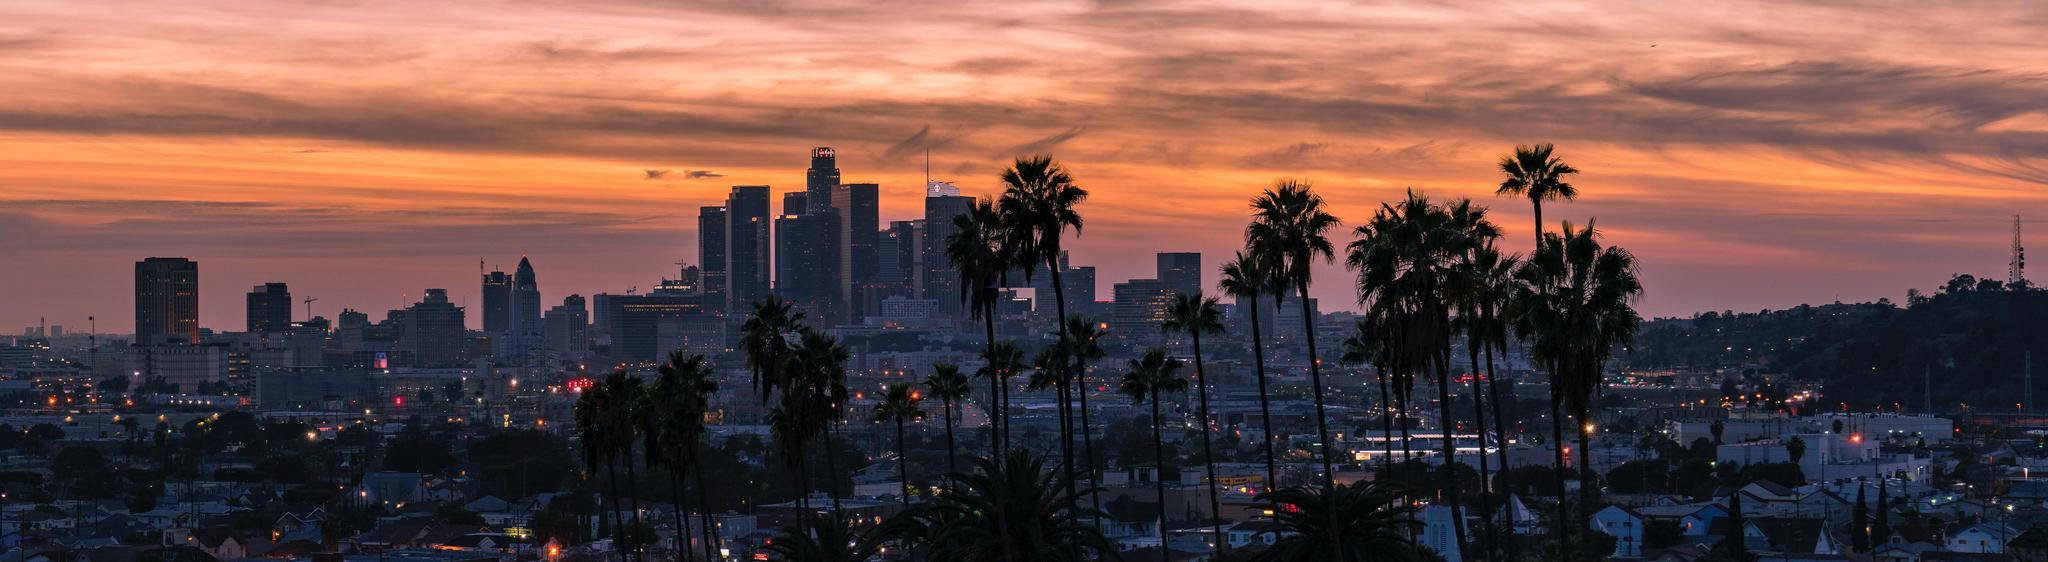 Los Angeles Party Bike - The #1 Los Angeles Pedal Pub Crawl